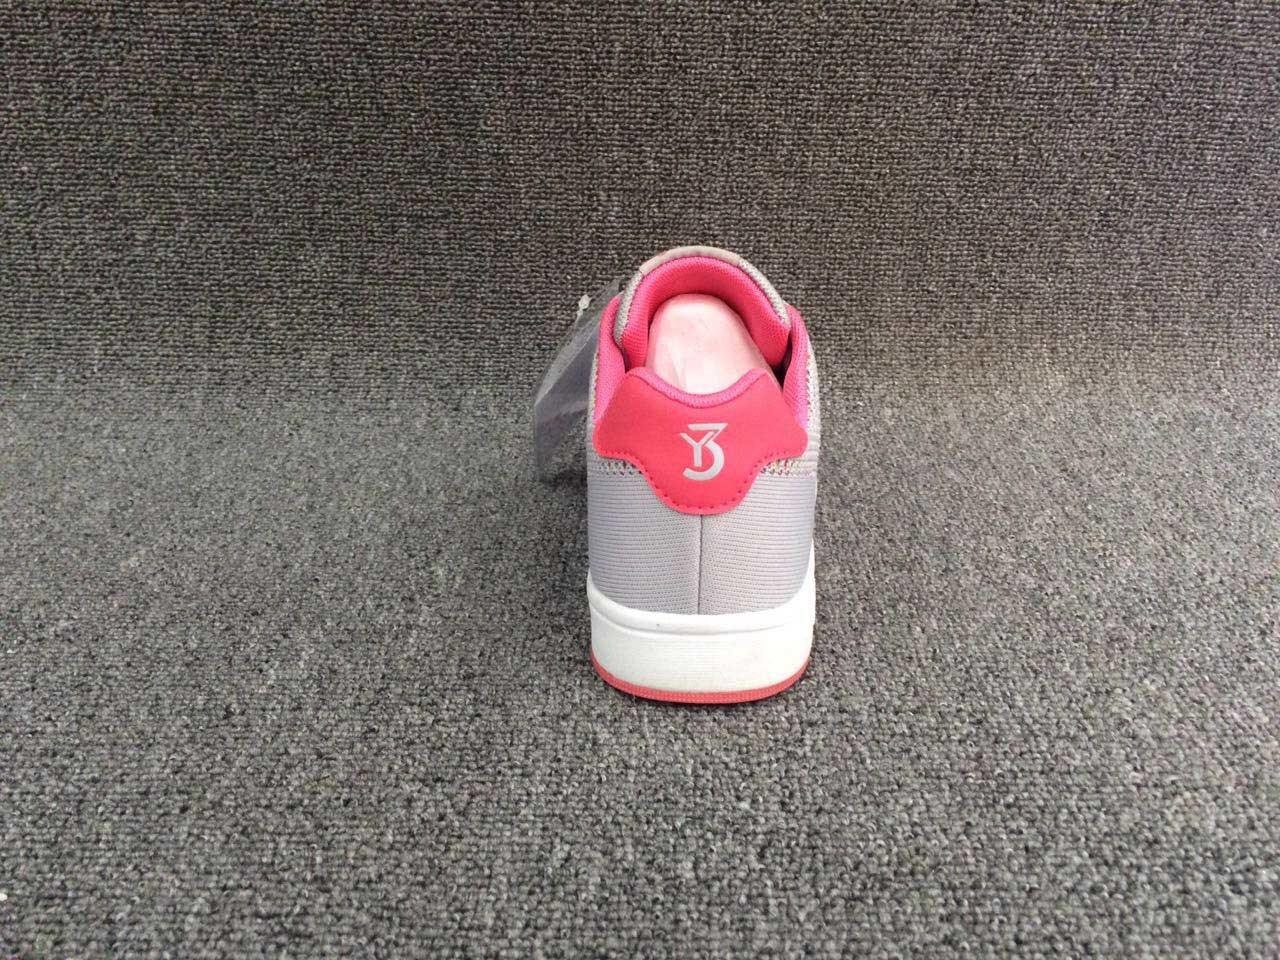 New Hot Sale Fashion Women′s Sneaker Shoes